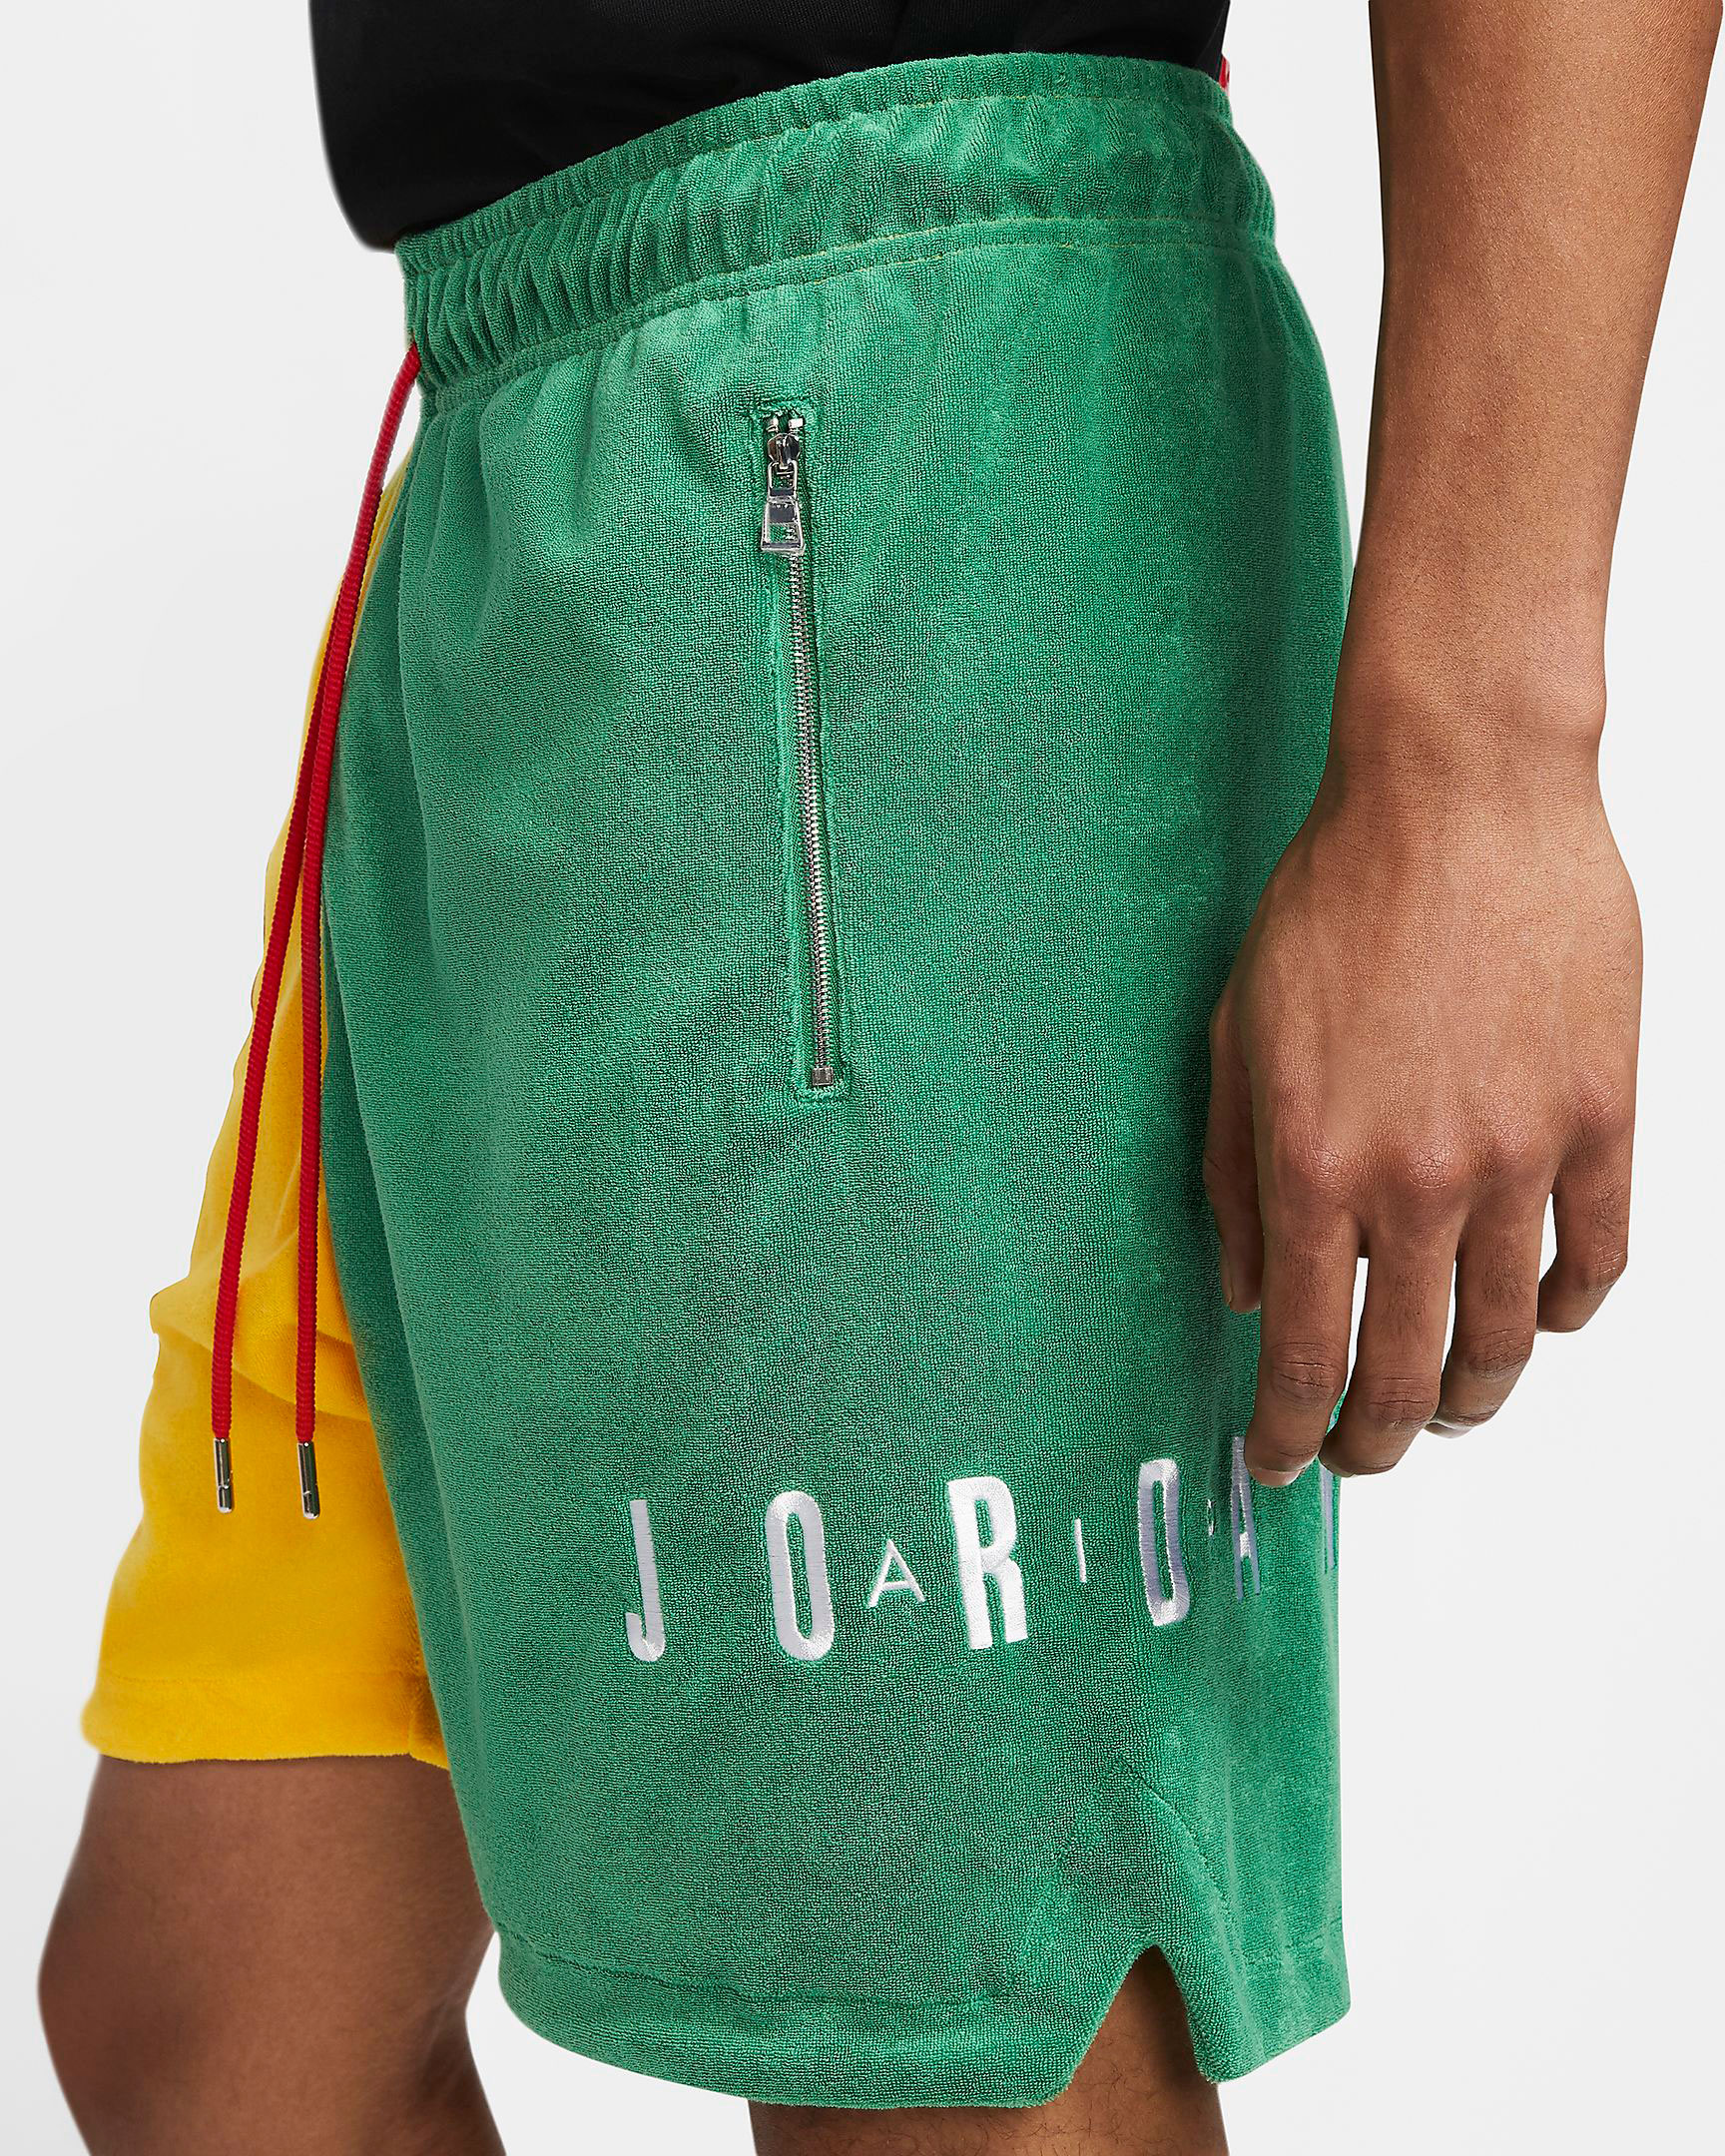 air-jordan-4-green-metallic-shorts-match-2